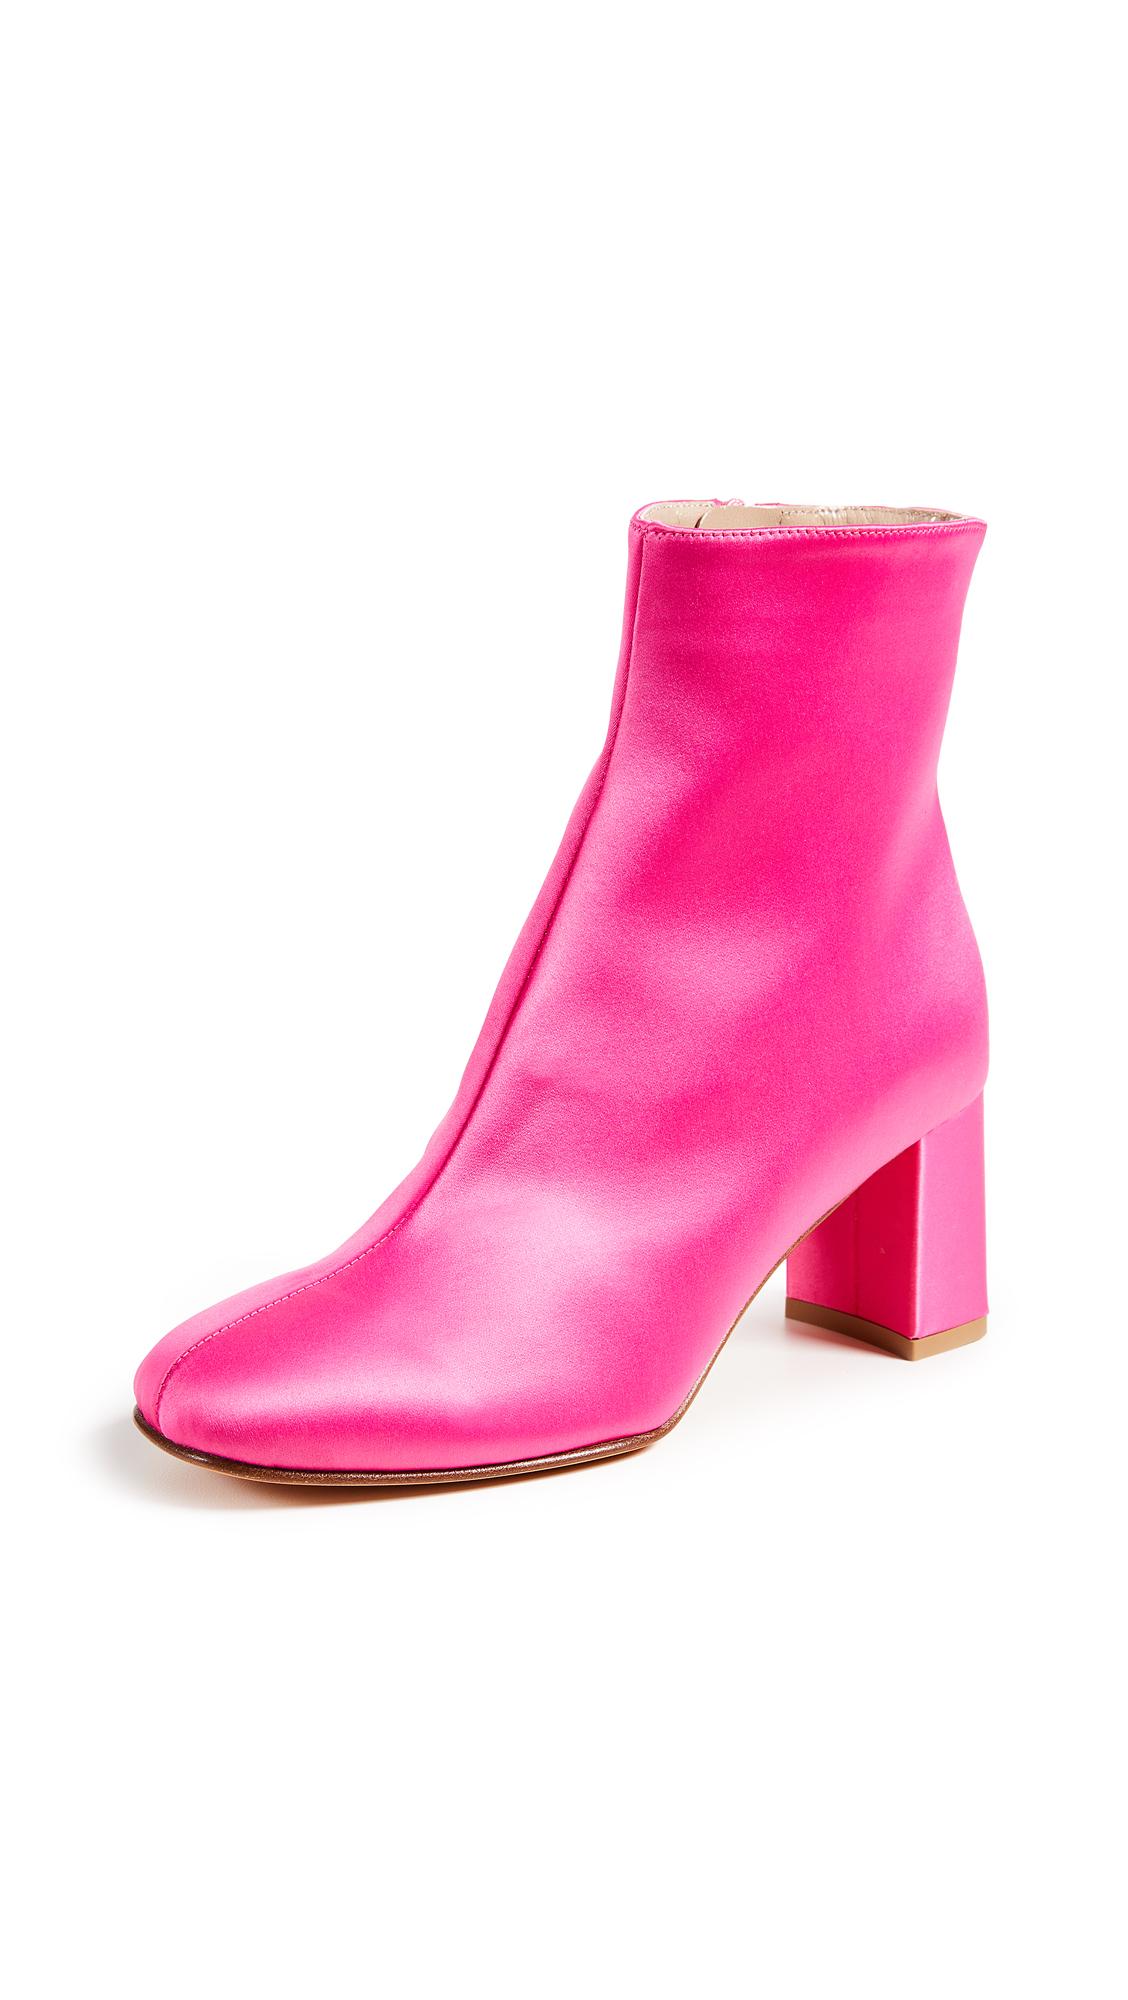 Maryam Nassir Zadeh Agnes Booties - Pink